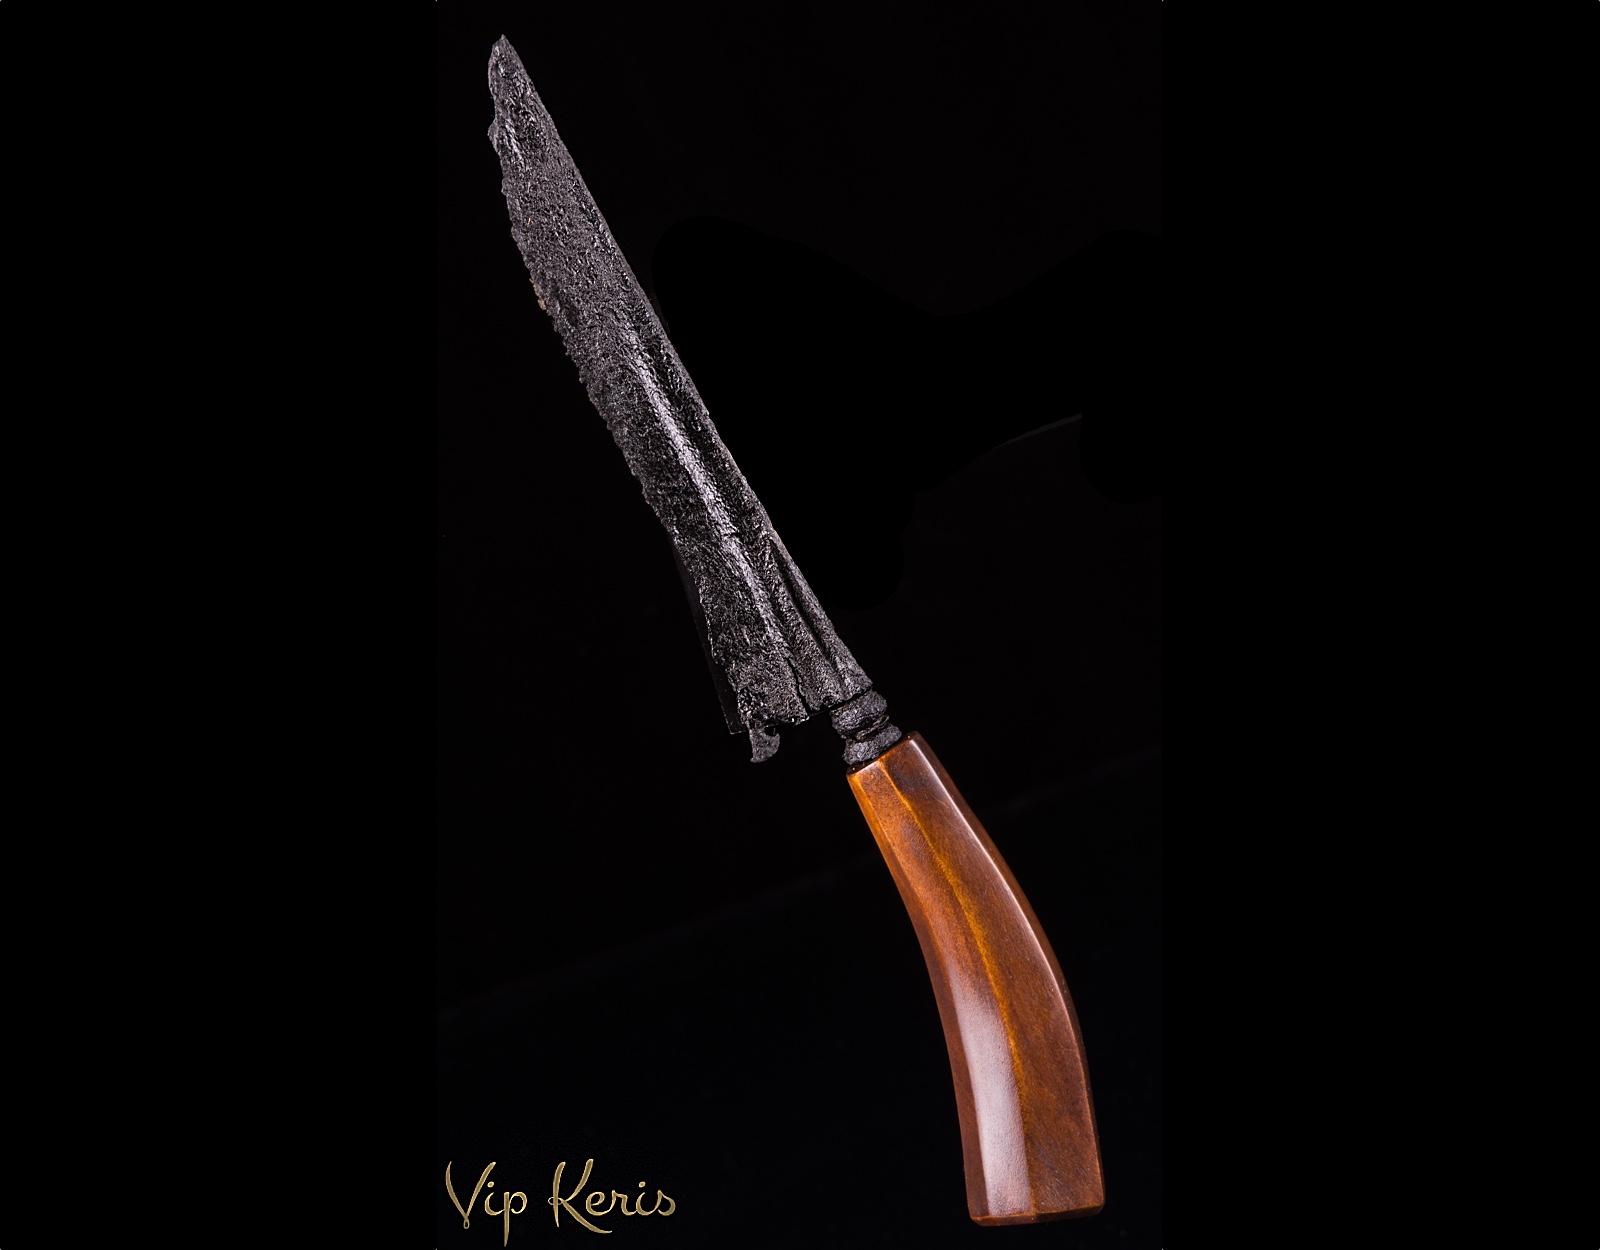 Нож Крис Wedung Singosari, целитель фото VipKeris